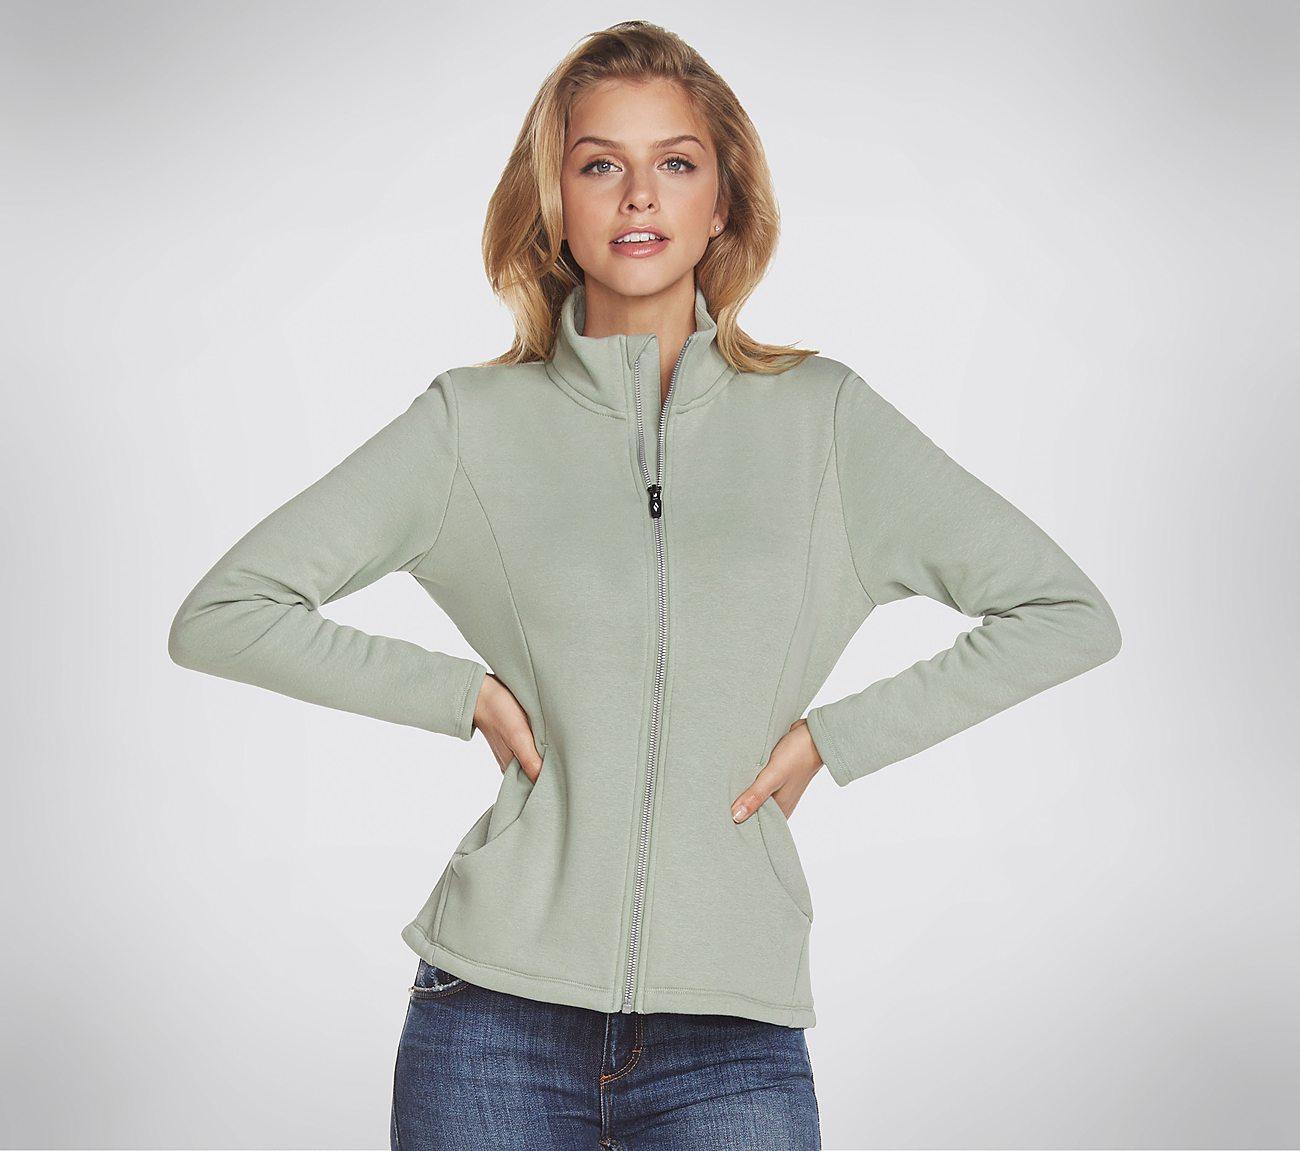 Skechers Apparel - Snuggle Fleece Full Zip Jacket